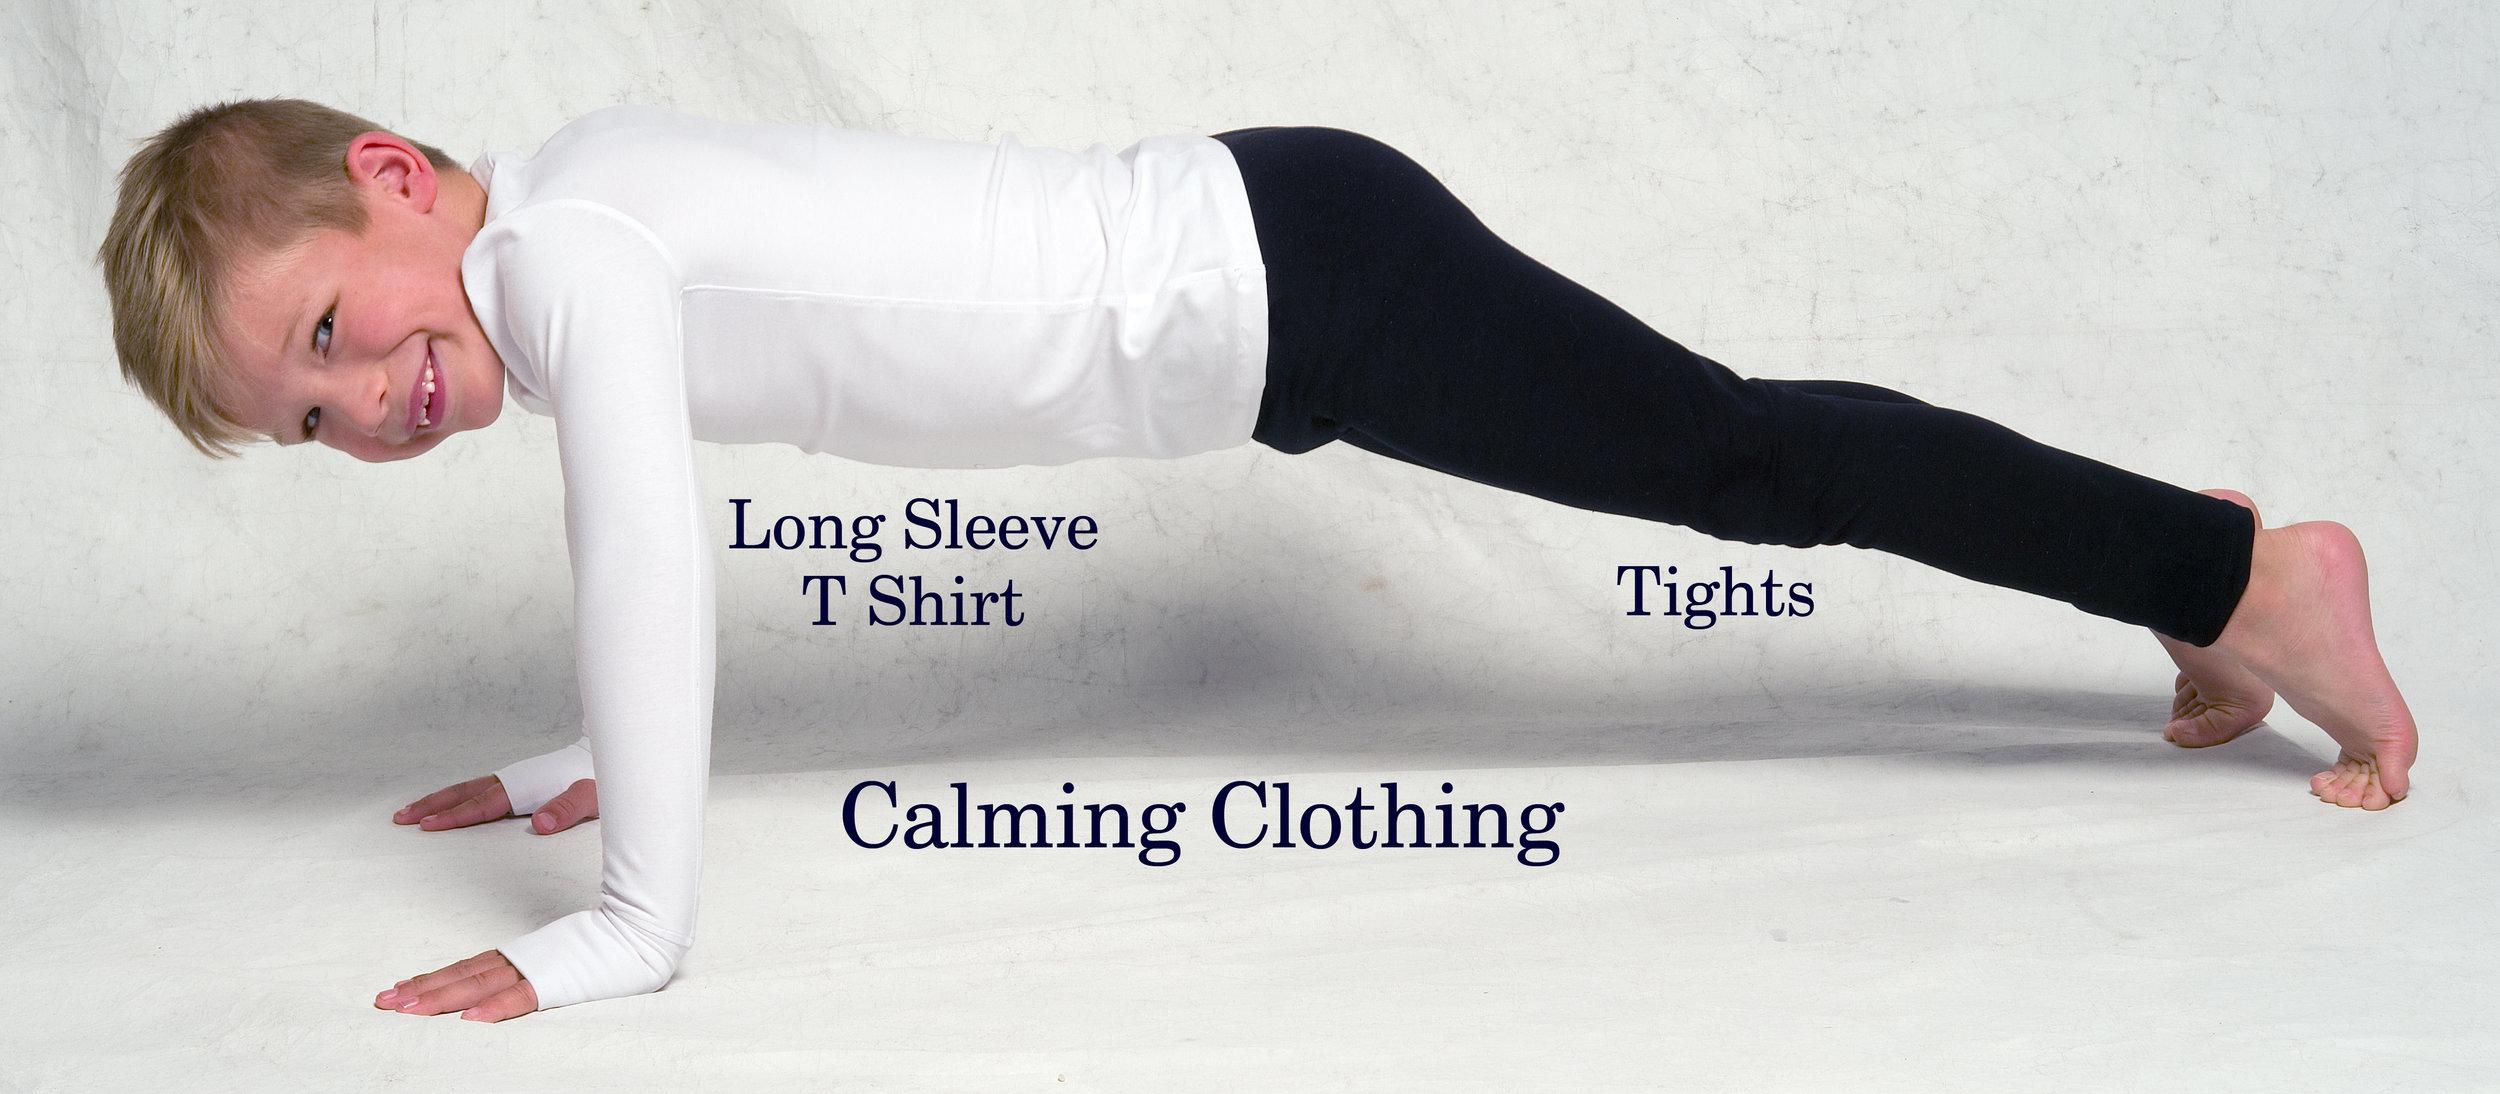 calming_clothing_long_sleeve_tshirt_white_tights.jpg